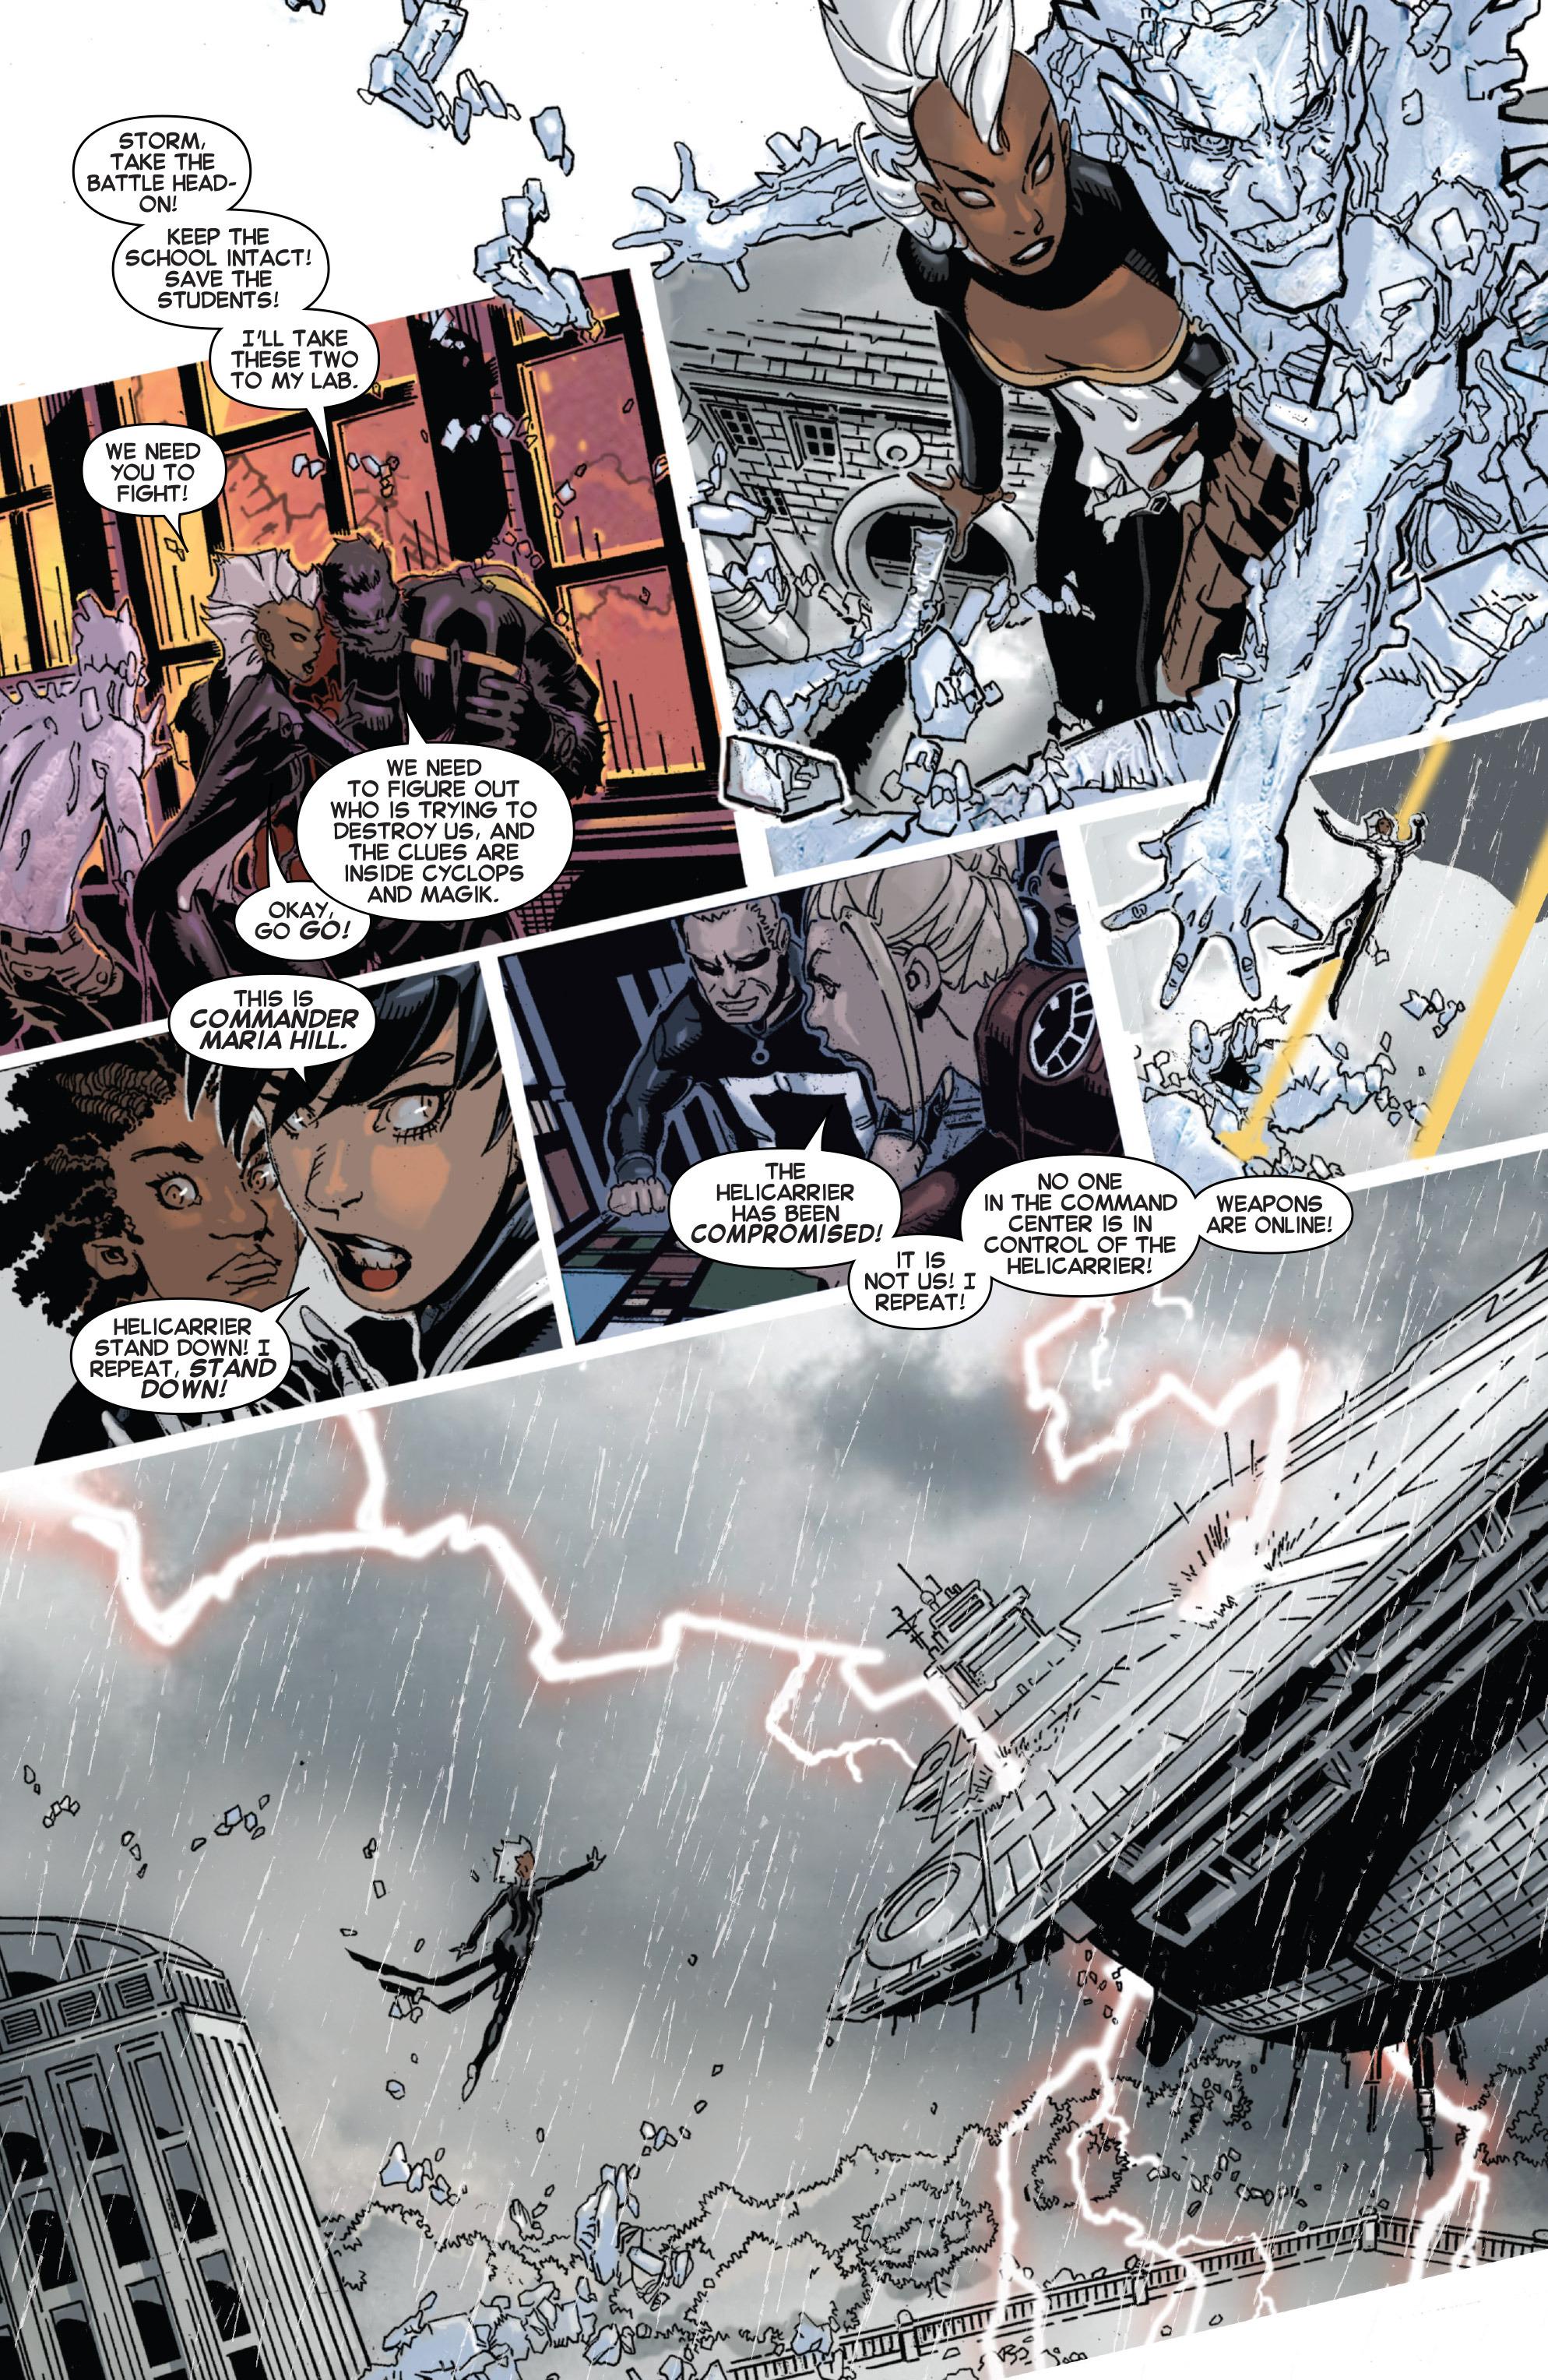 Read online Uncanny X-Men (2013) comic -  Issue # _TPB 4 - vs. S.H.I.E.L.D - 56